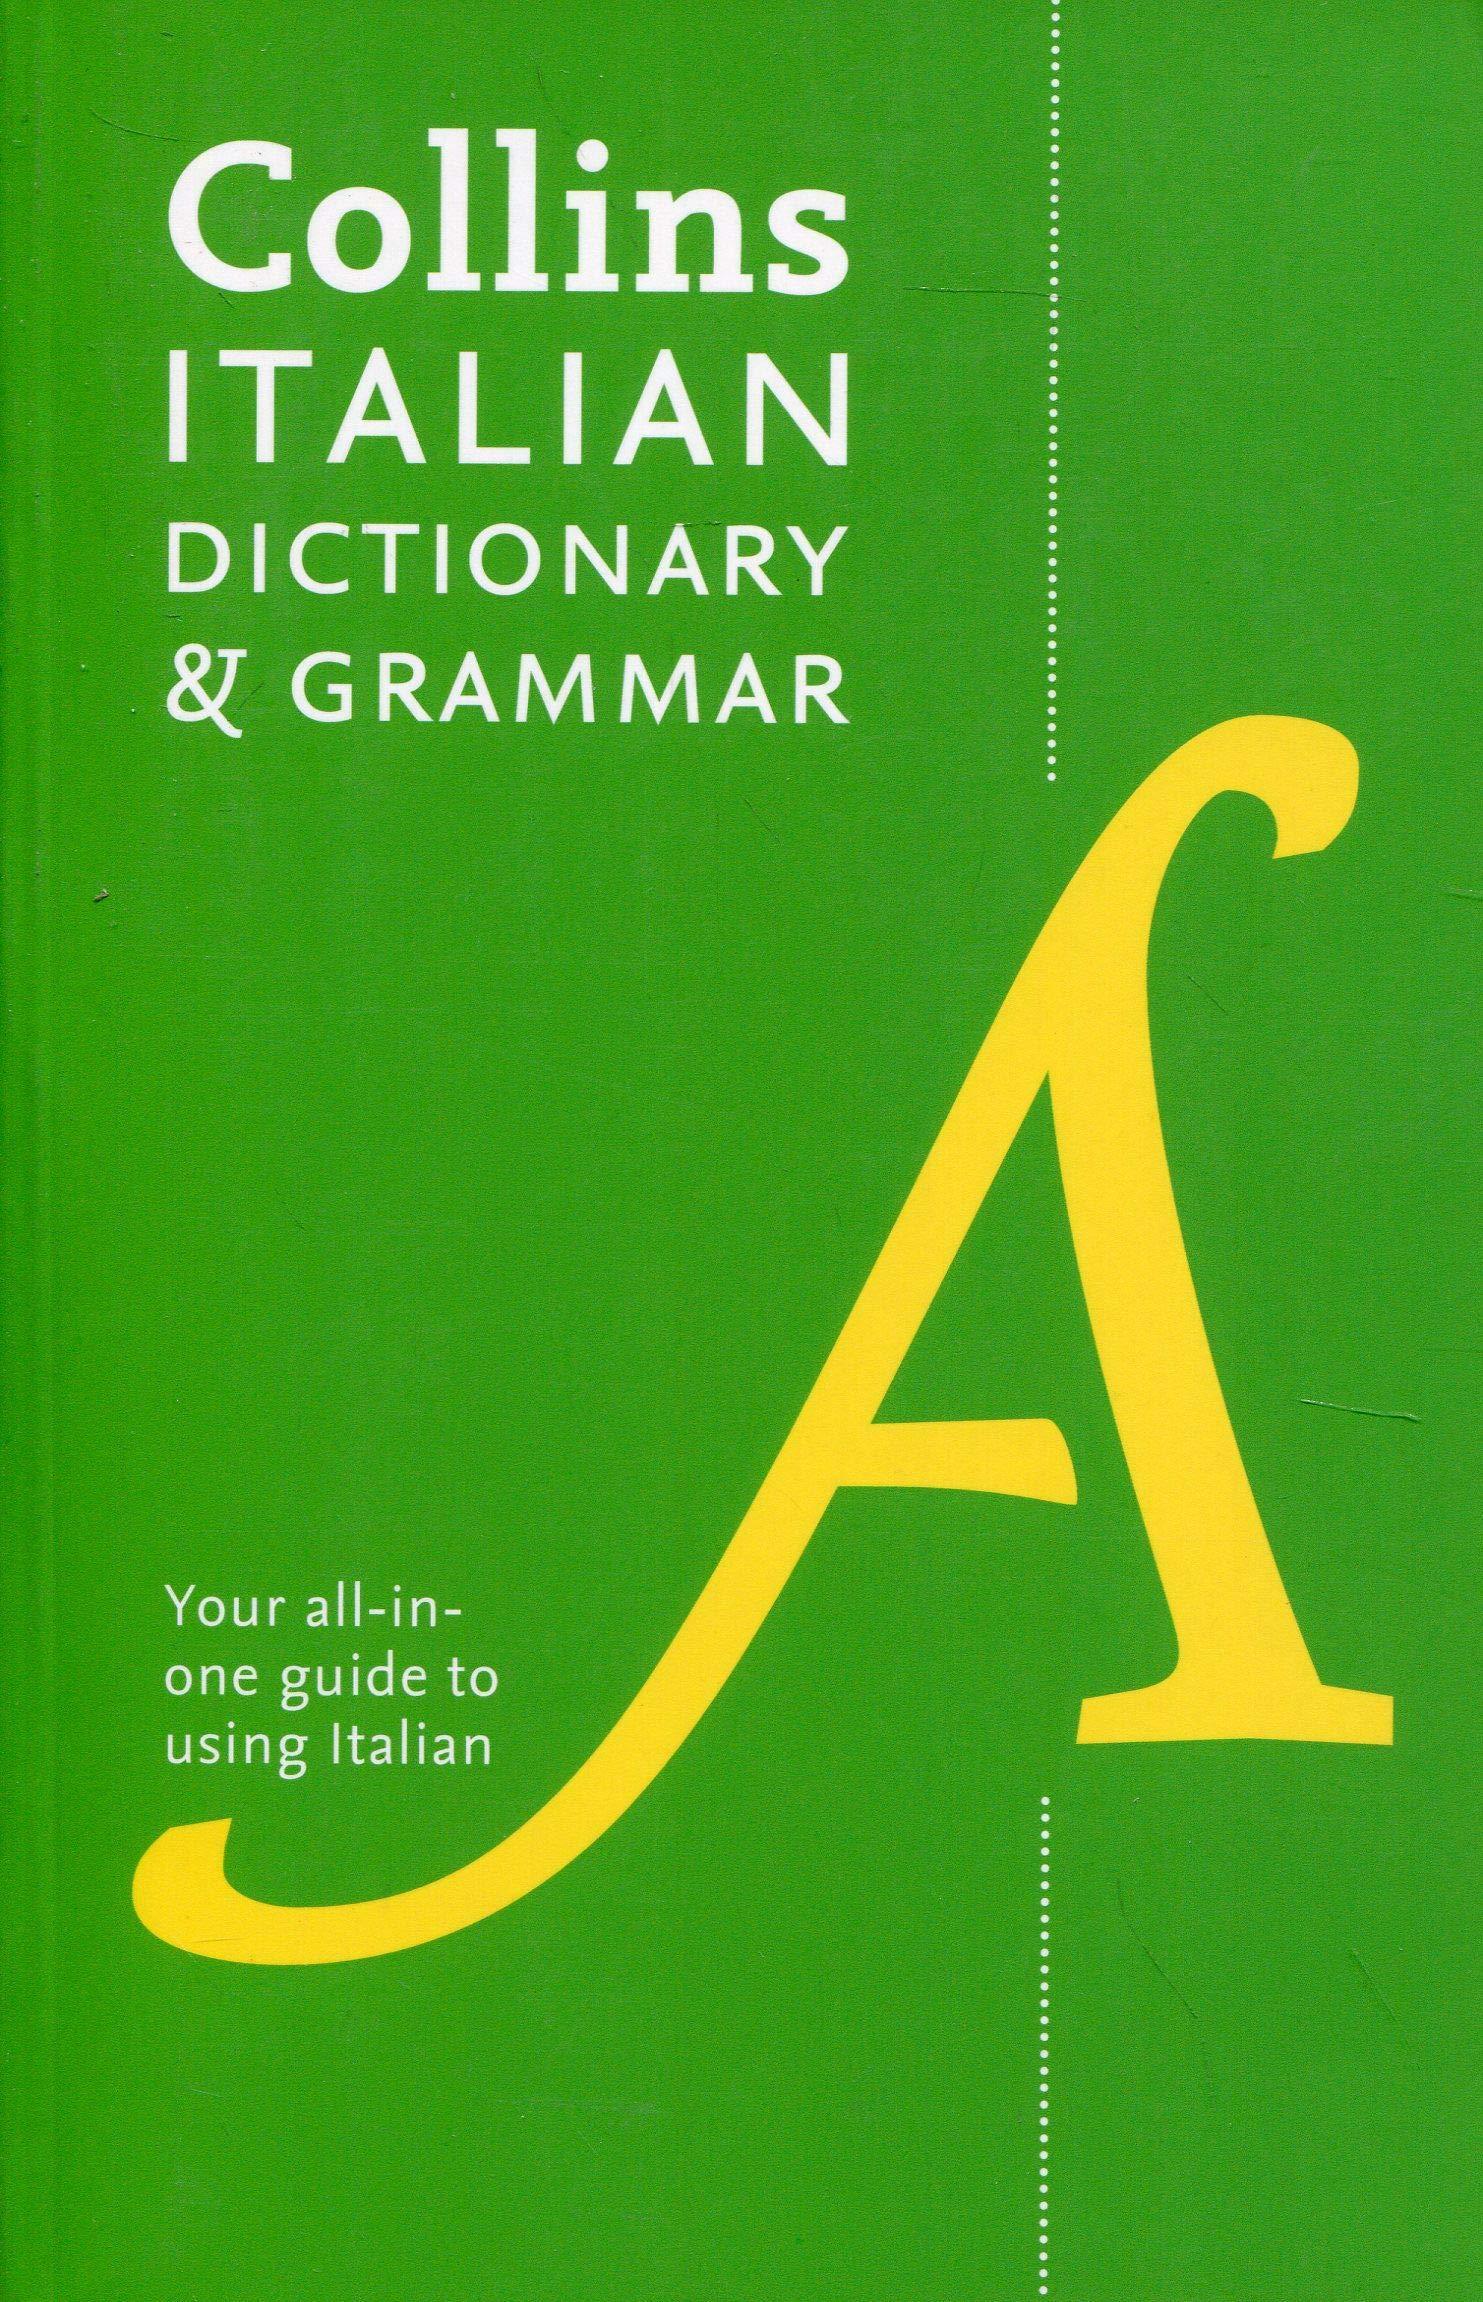 Collins Italian Dictionary And Grammar 120 000 Translations Plus Grammar Tips Italian And English Edition 9780008241407 Amazon Com Books